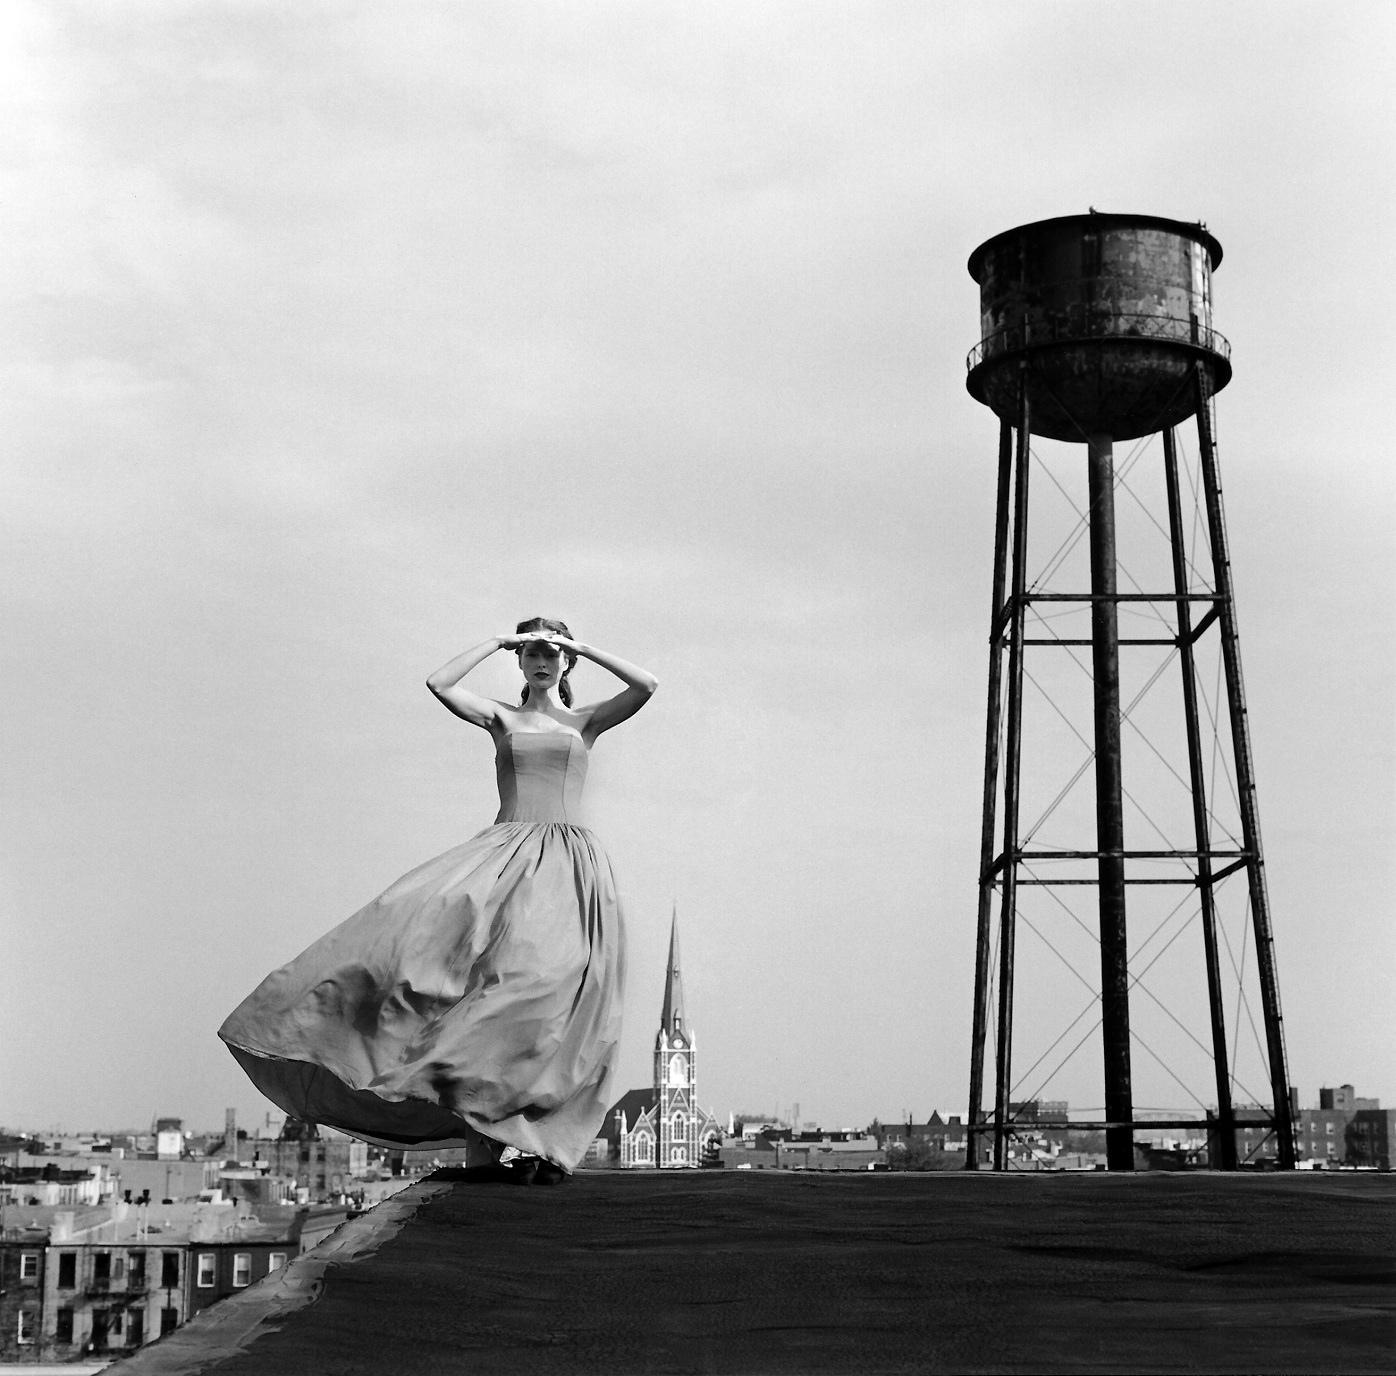 Viktoria standing on roof near watertower, Brooklyn, NY  2000 Silver gelatin print 27 x 27 cm (image) 56 x 66 cm (mount)